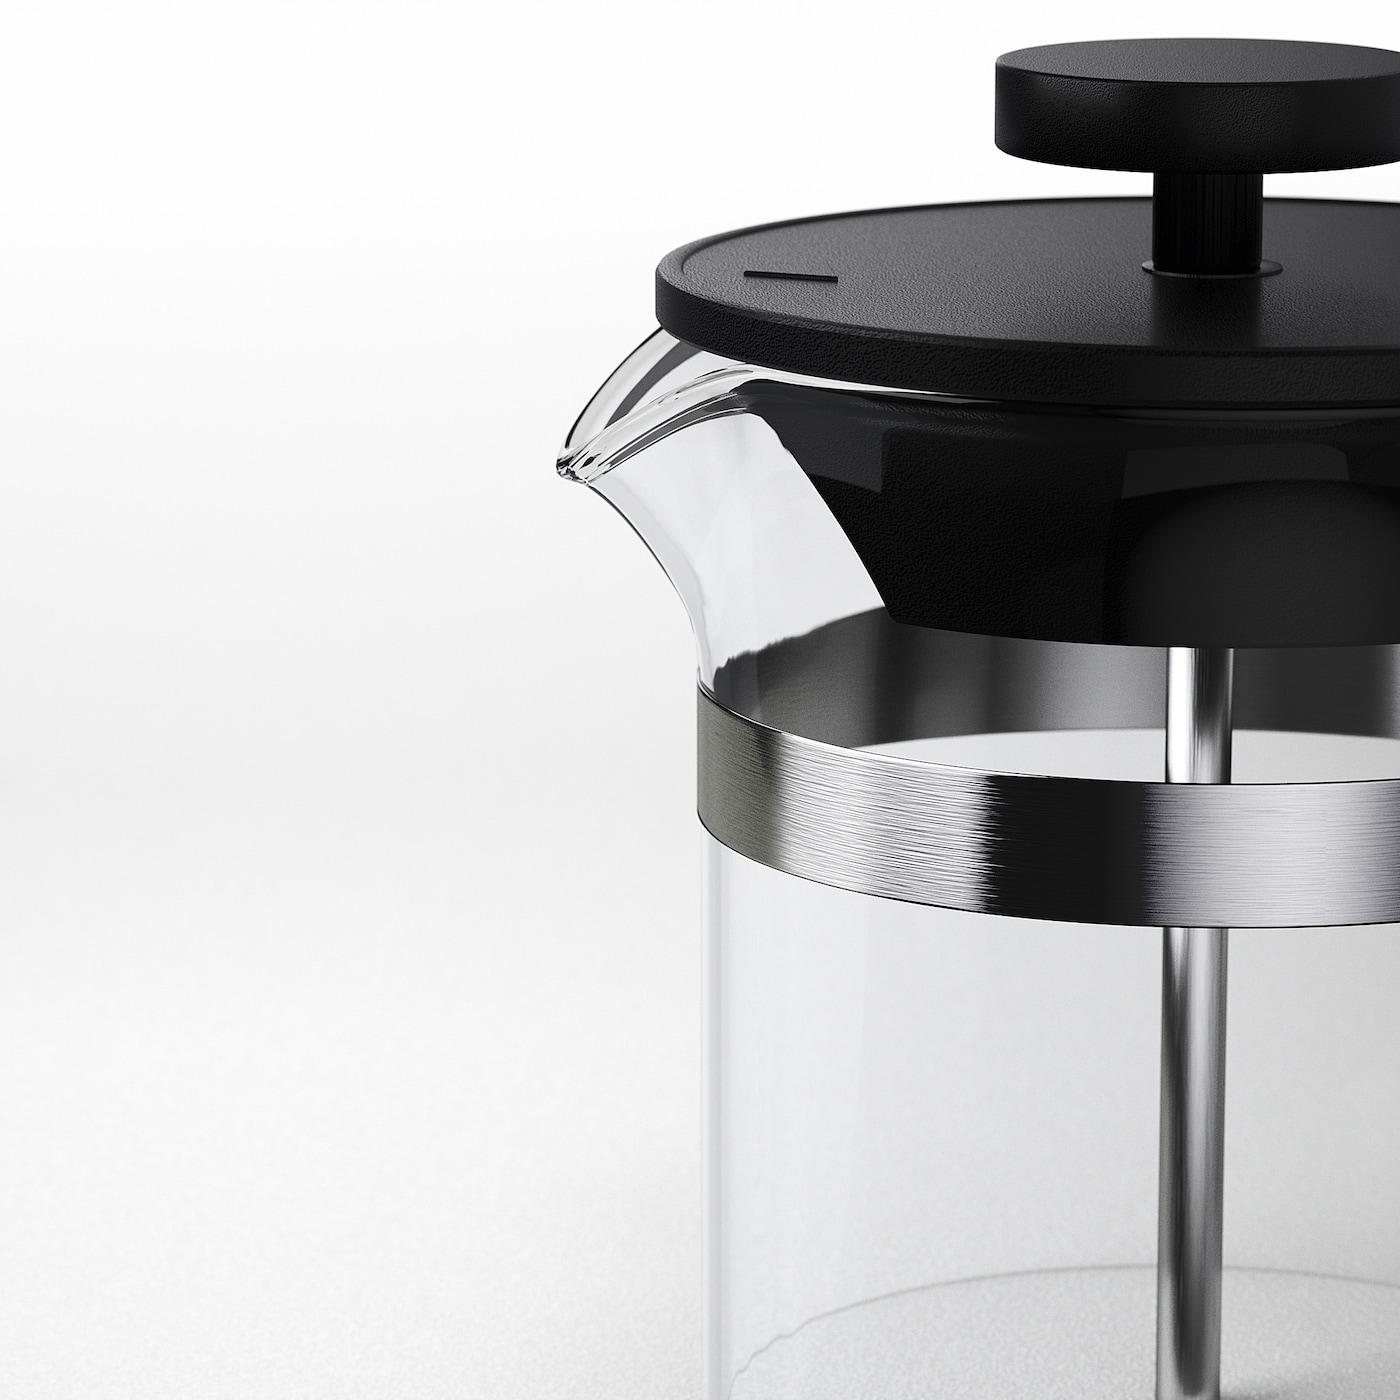 UPPHETTA Coffee/tea maker, glass/stainless steel, 0.4 l